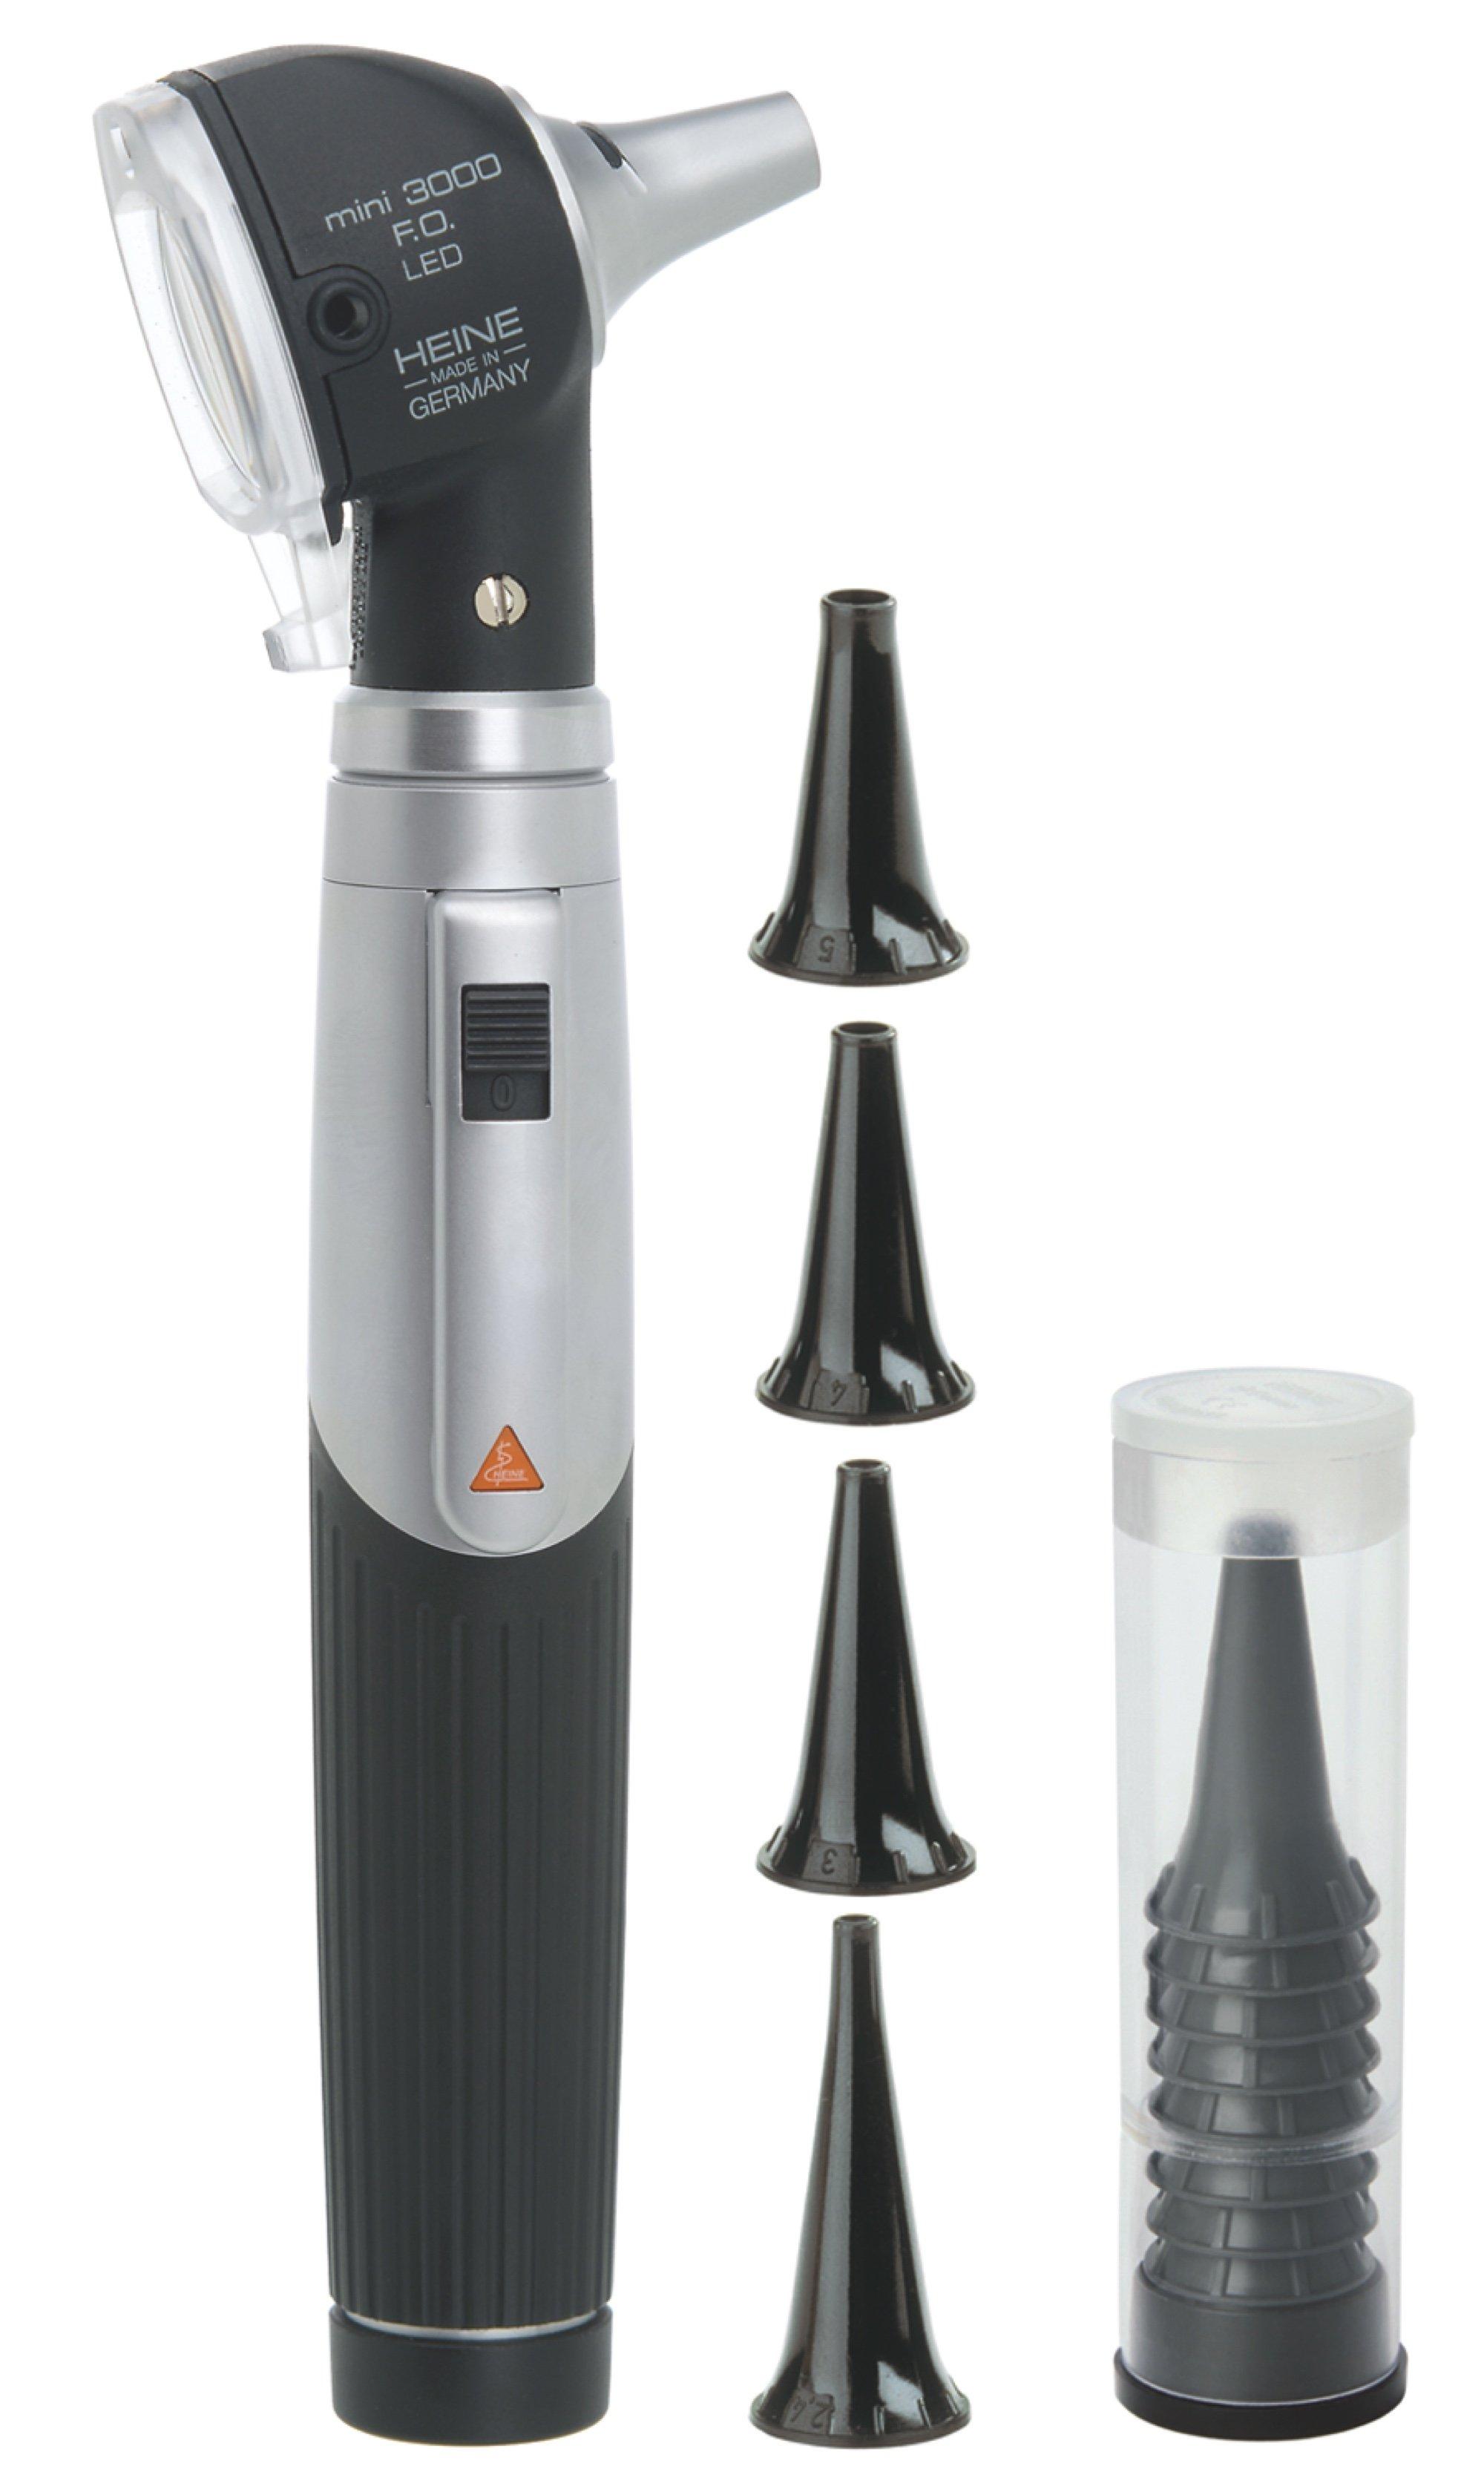 HEINE mini3000 LED Otoscope Set with battery handle